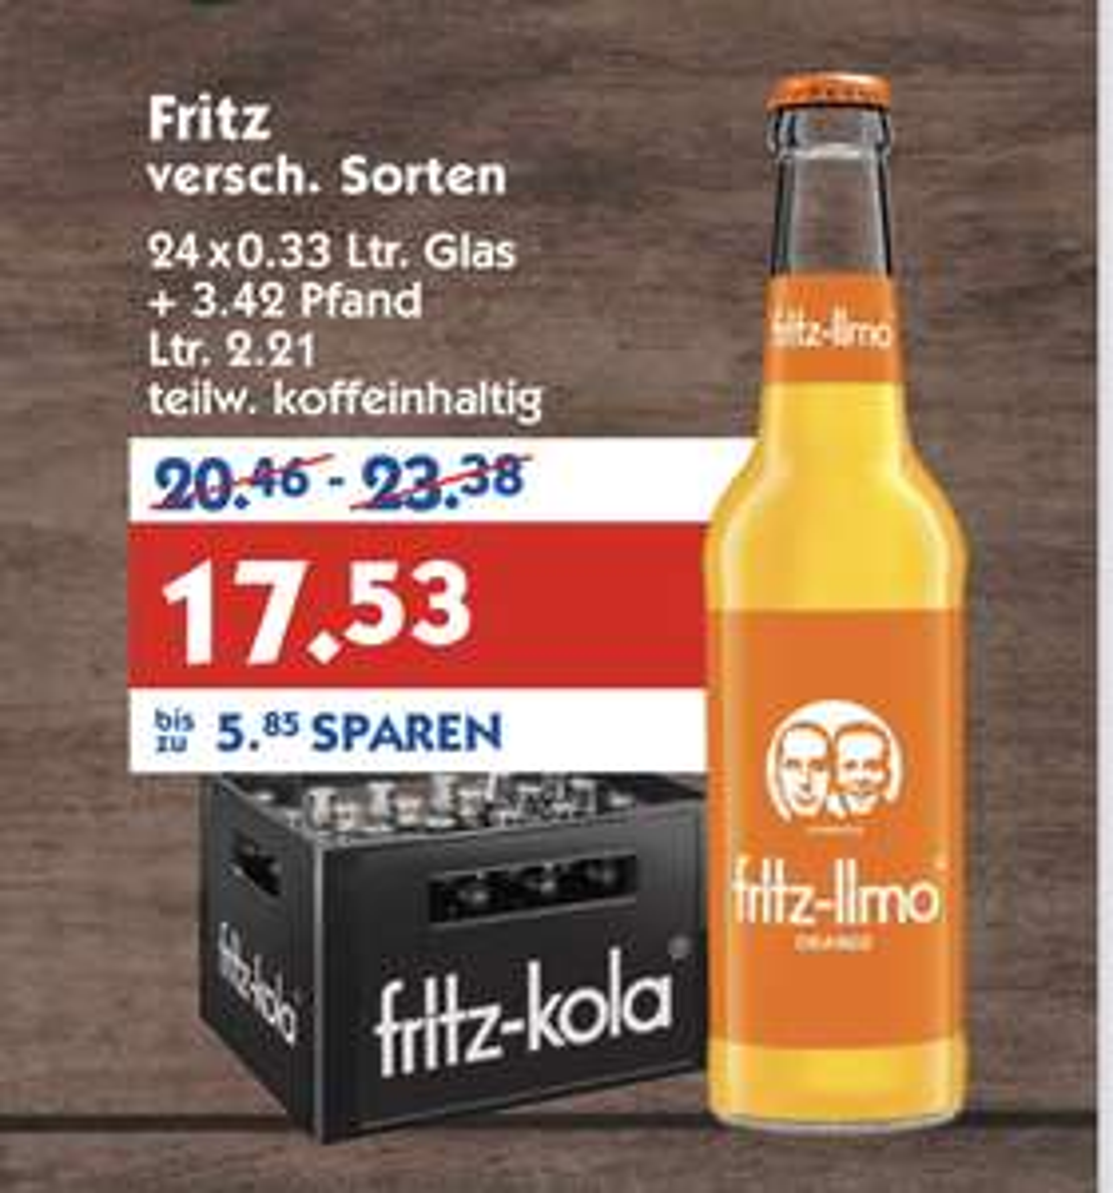 Fritz Kola 24x0,33l bei Hol' ab! [Lokal]